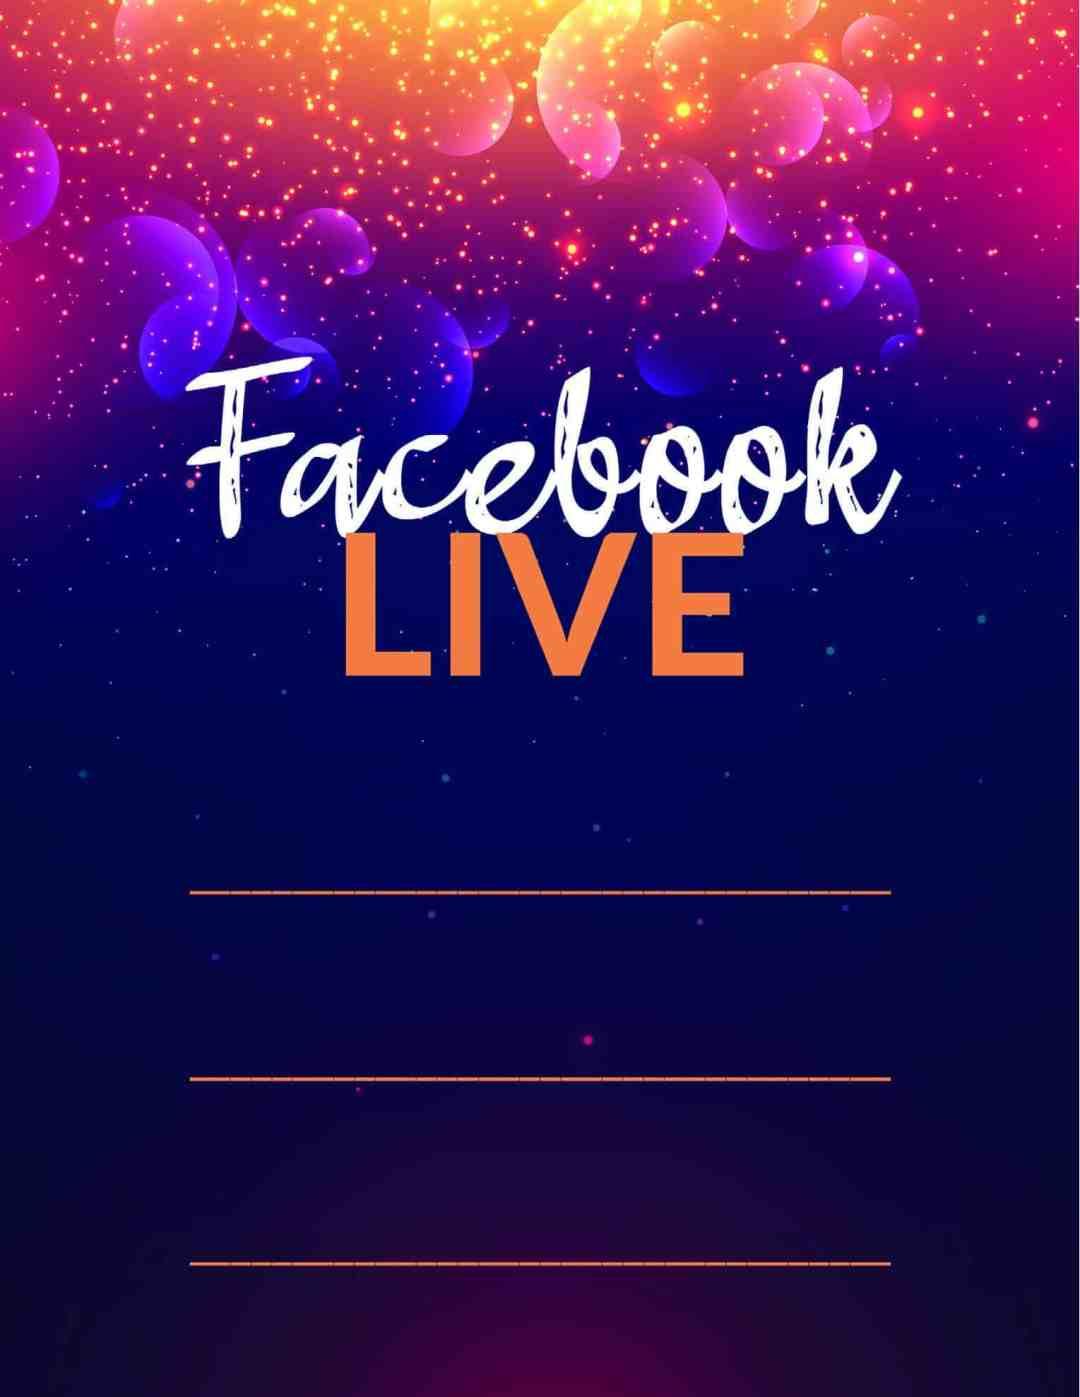 Facebook Live Invitations - Blue Purple - All Free Invitations